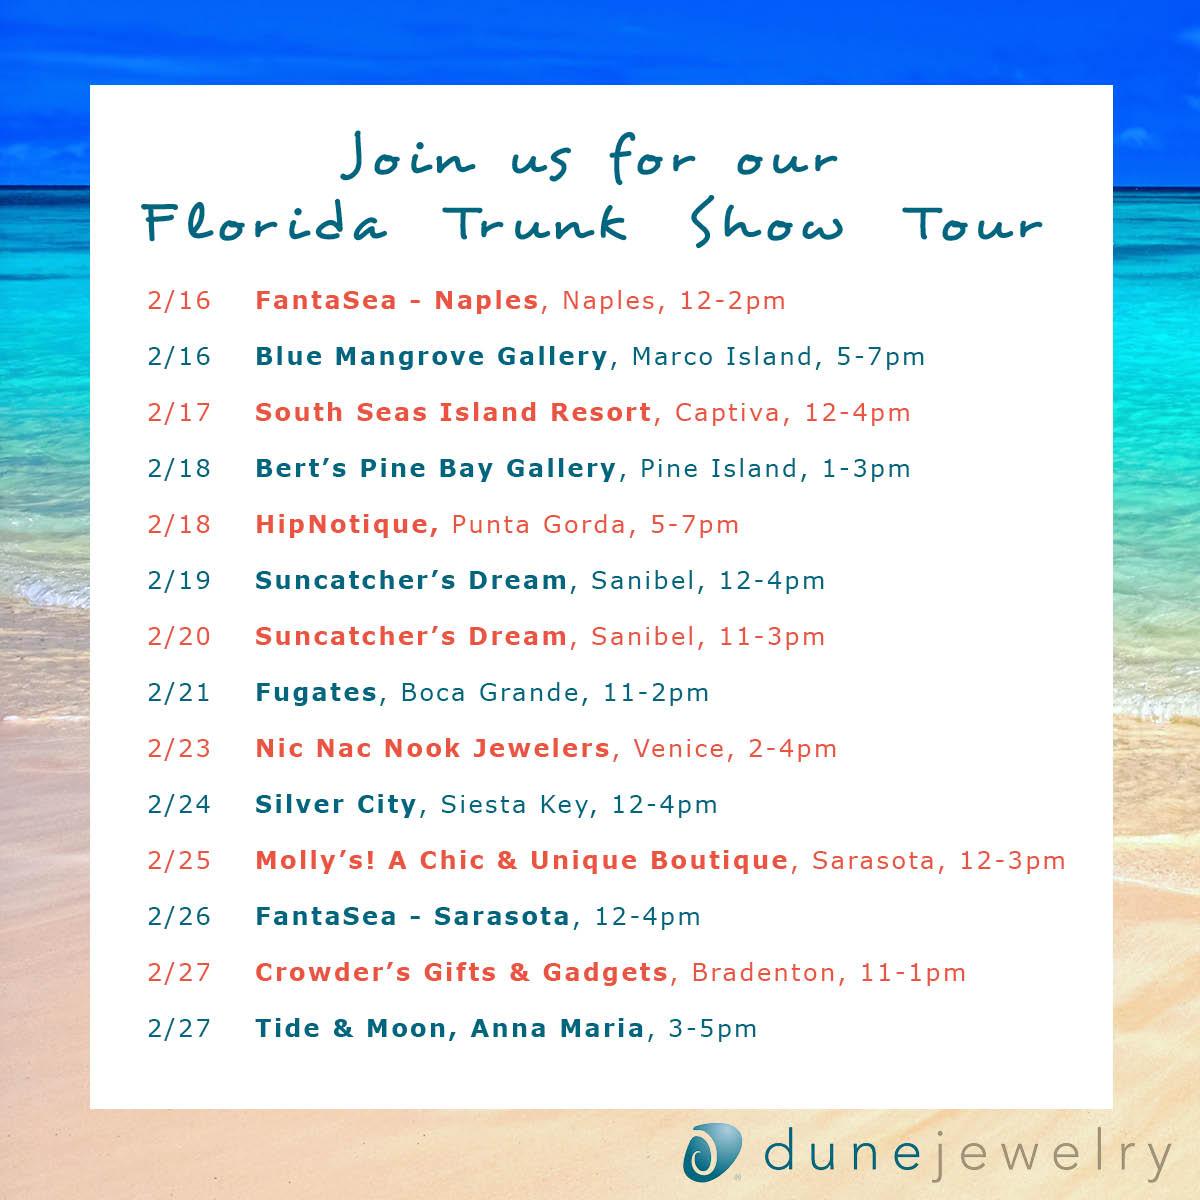 dunejewelry-trunkshowschedremainingdates